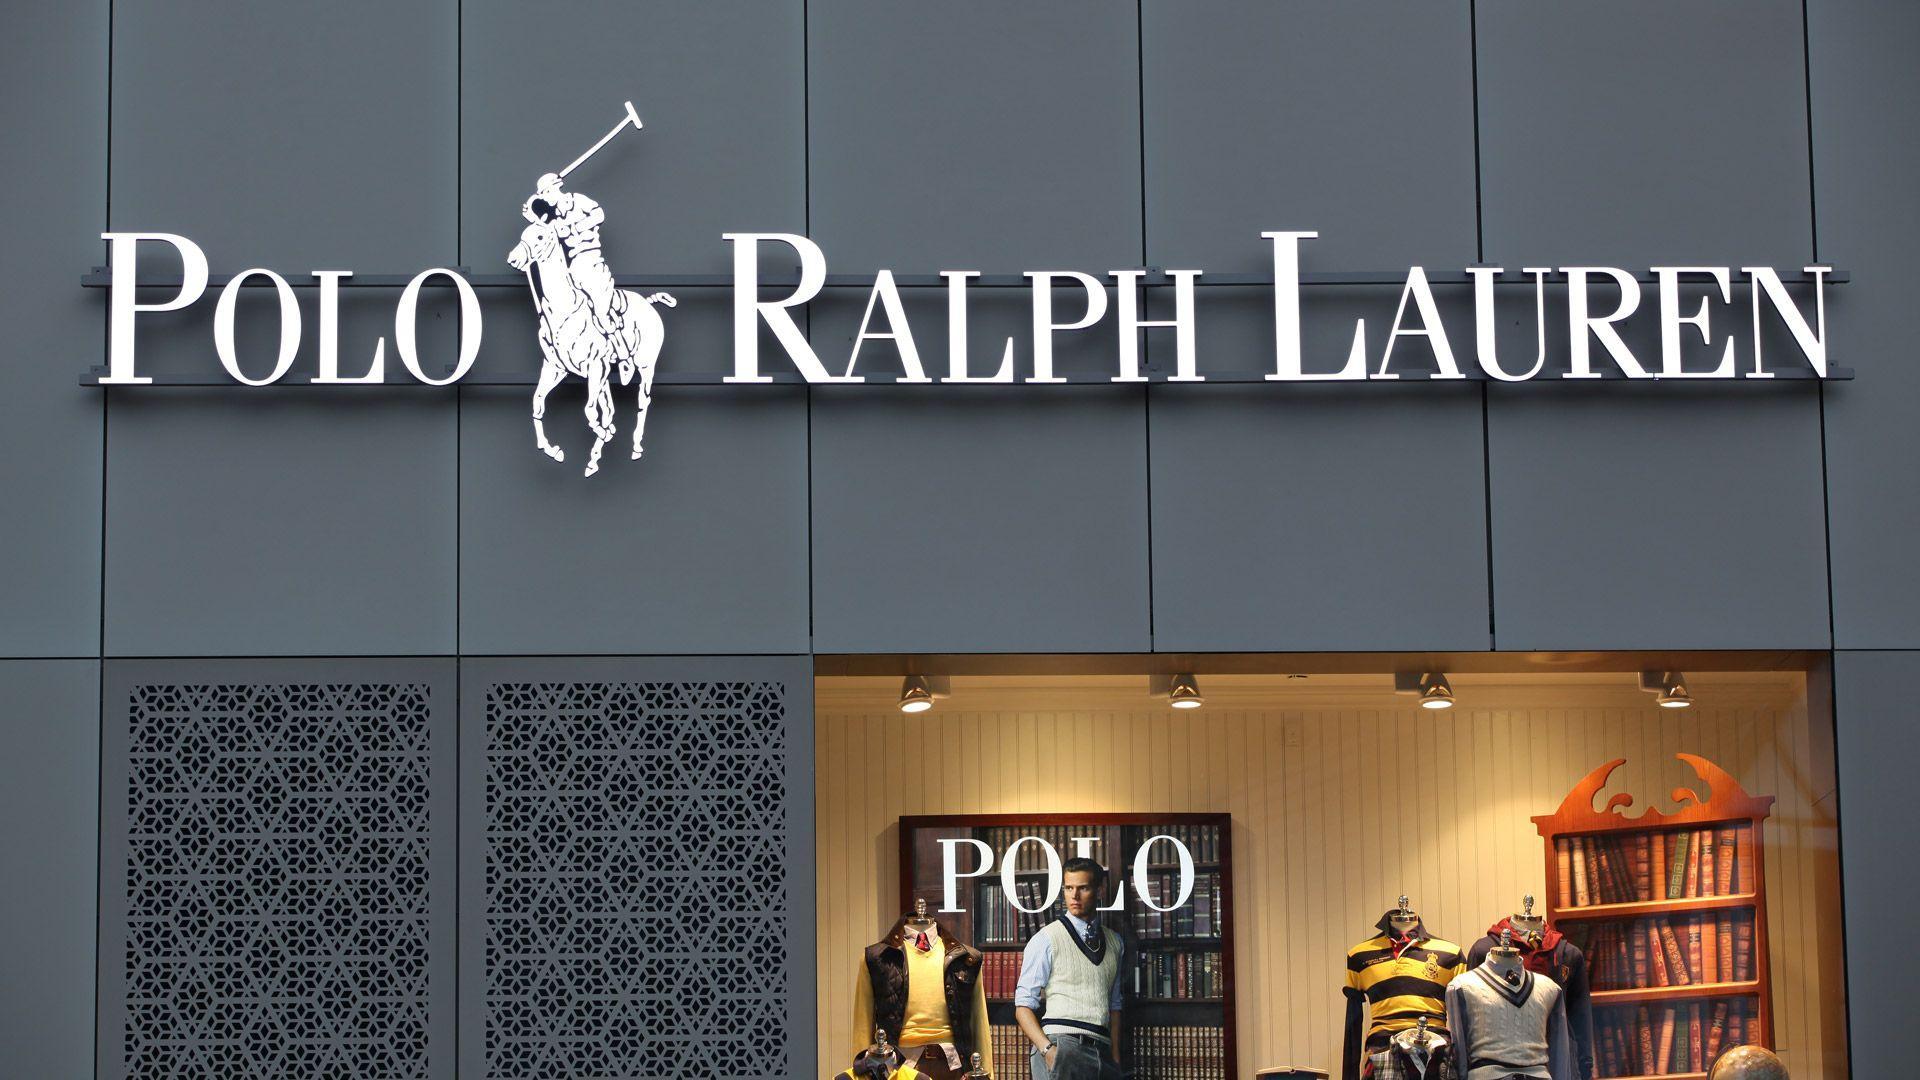 Polo Ralph Lauren Wallpapers - Wallpaper Cave